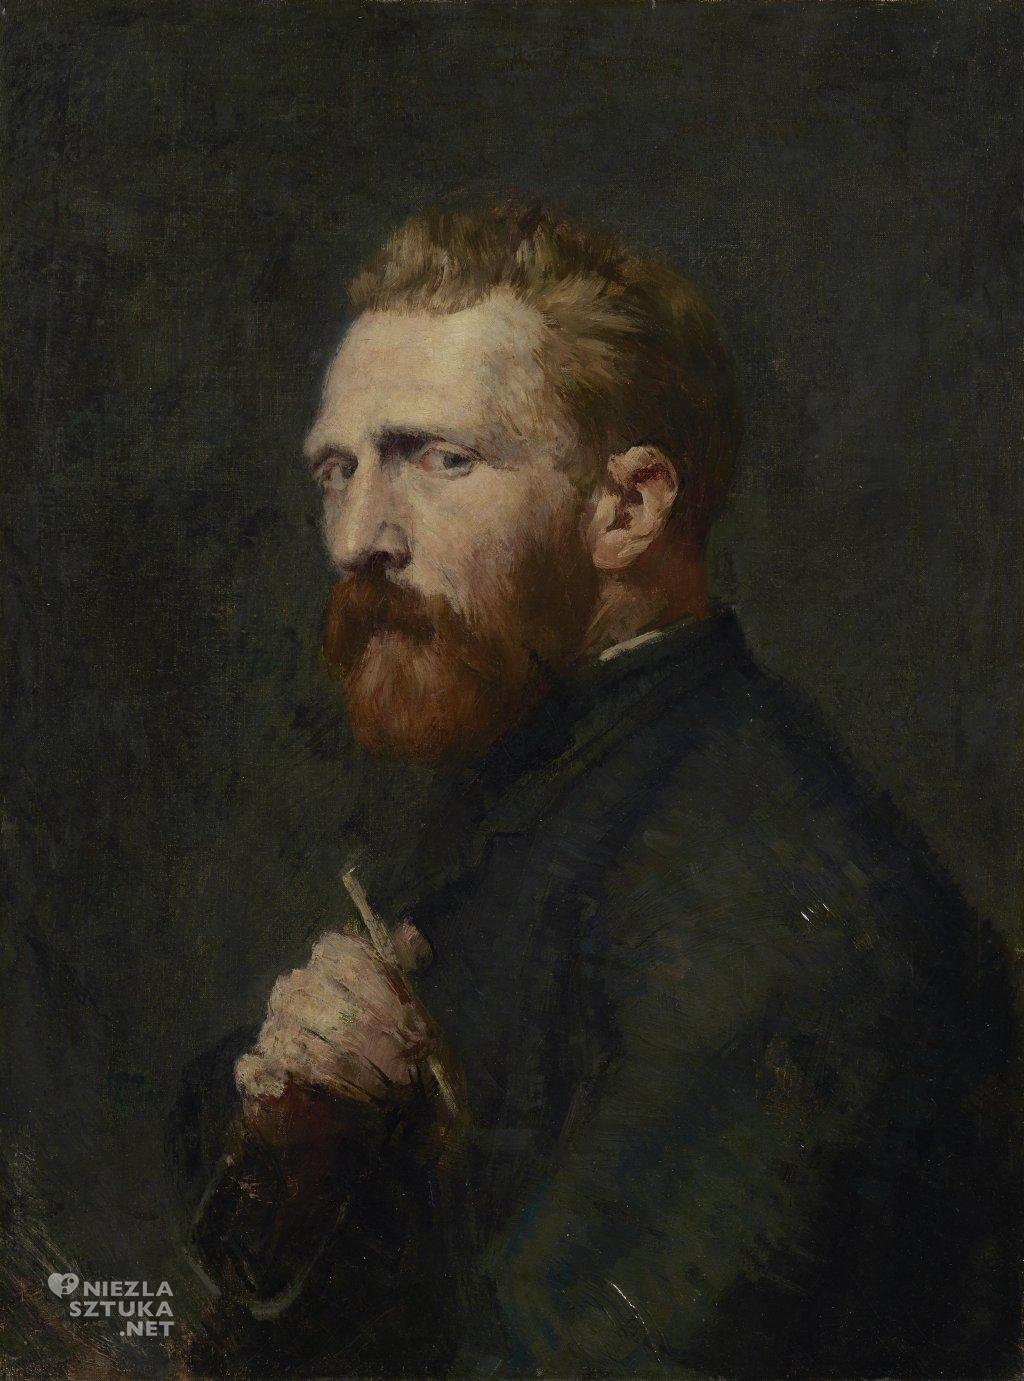 Portret Vincenta van Gogha pędzla Johna Petera Russell'a, 1886,